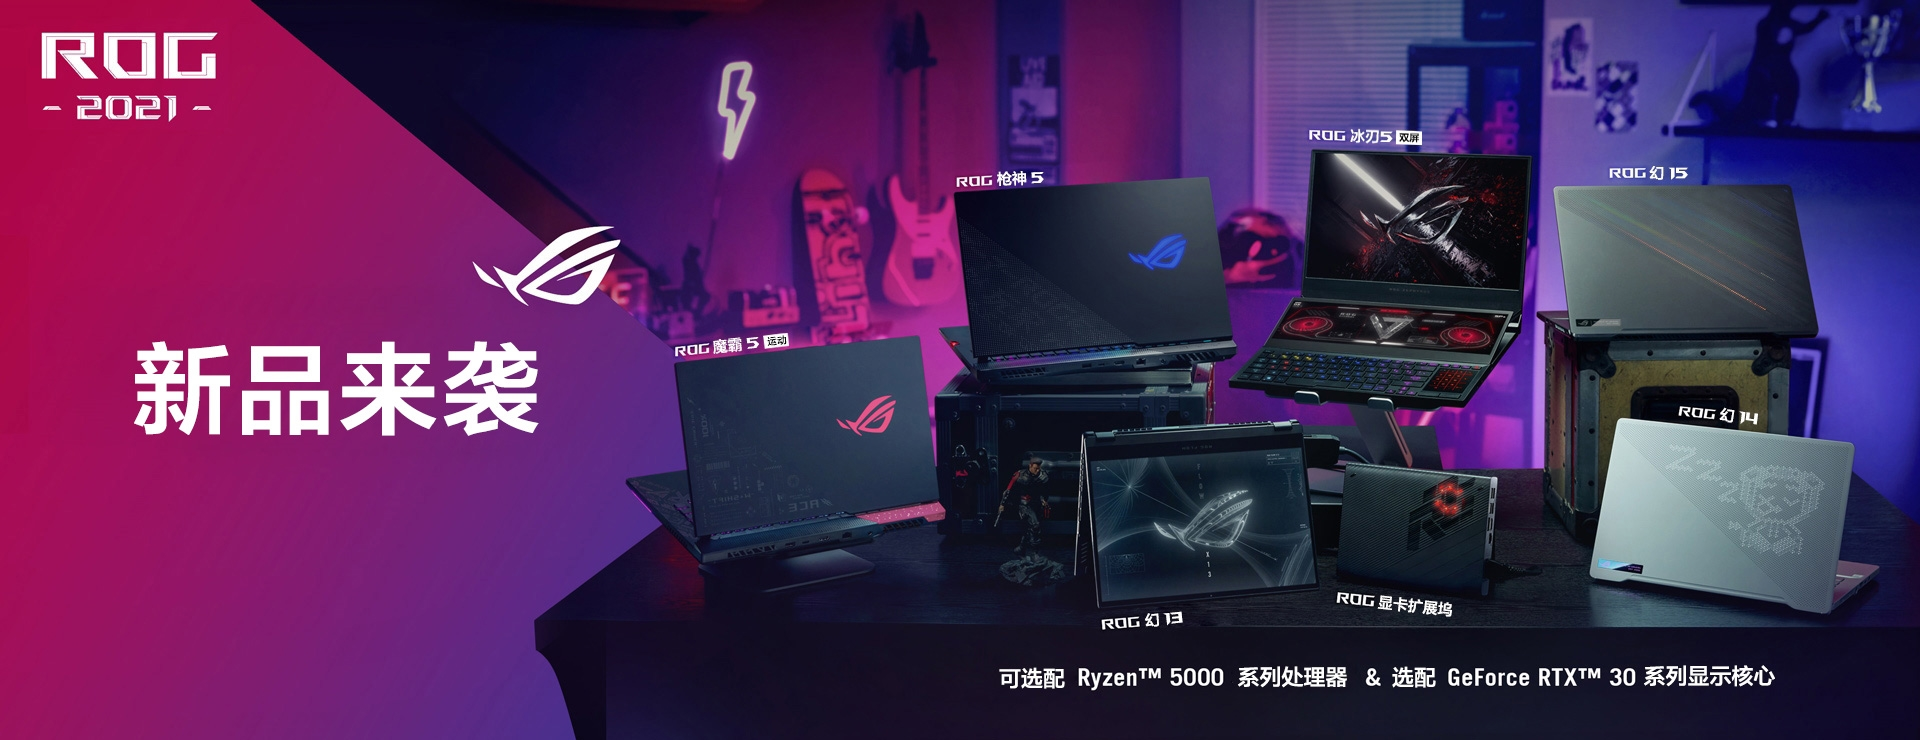 2021-ces-rog-gaming-laptops